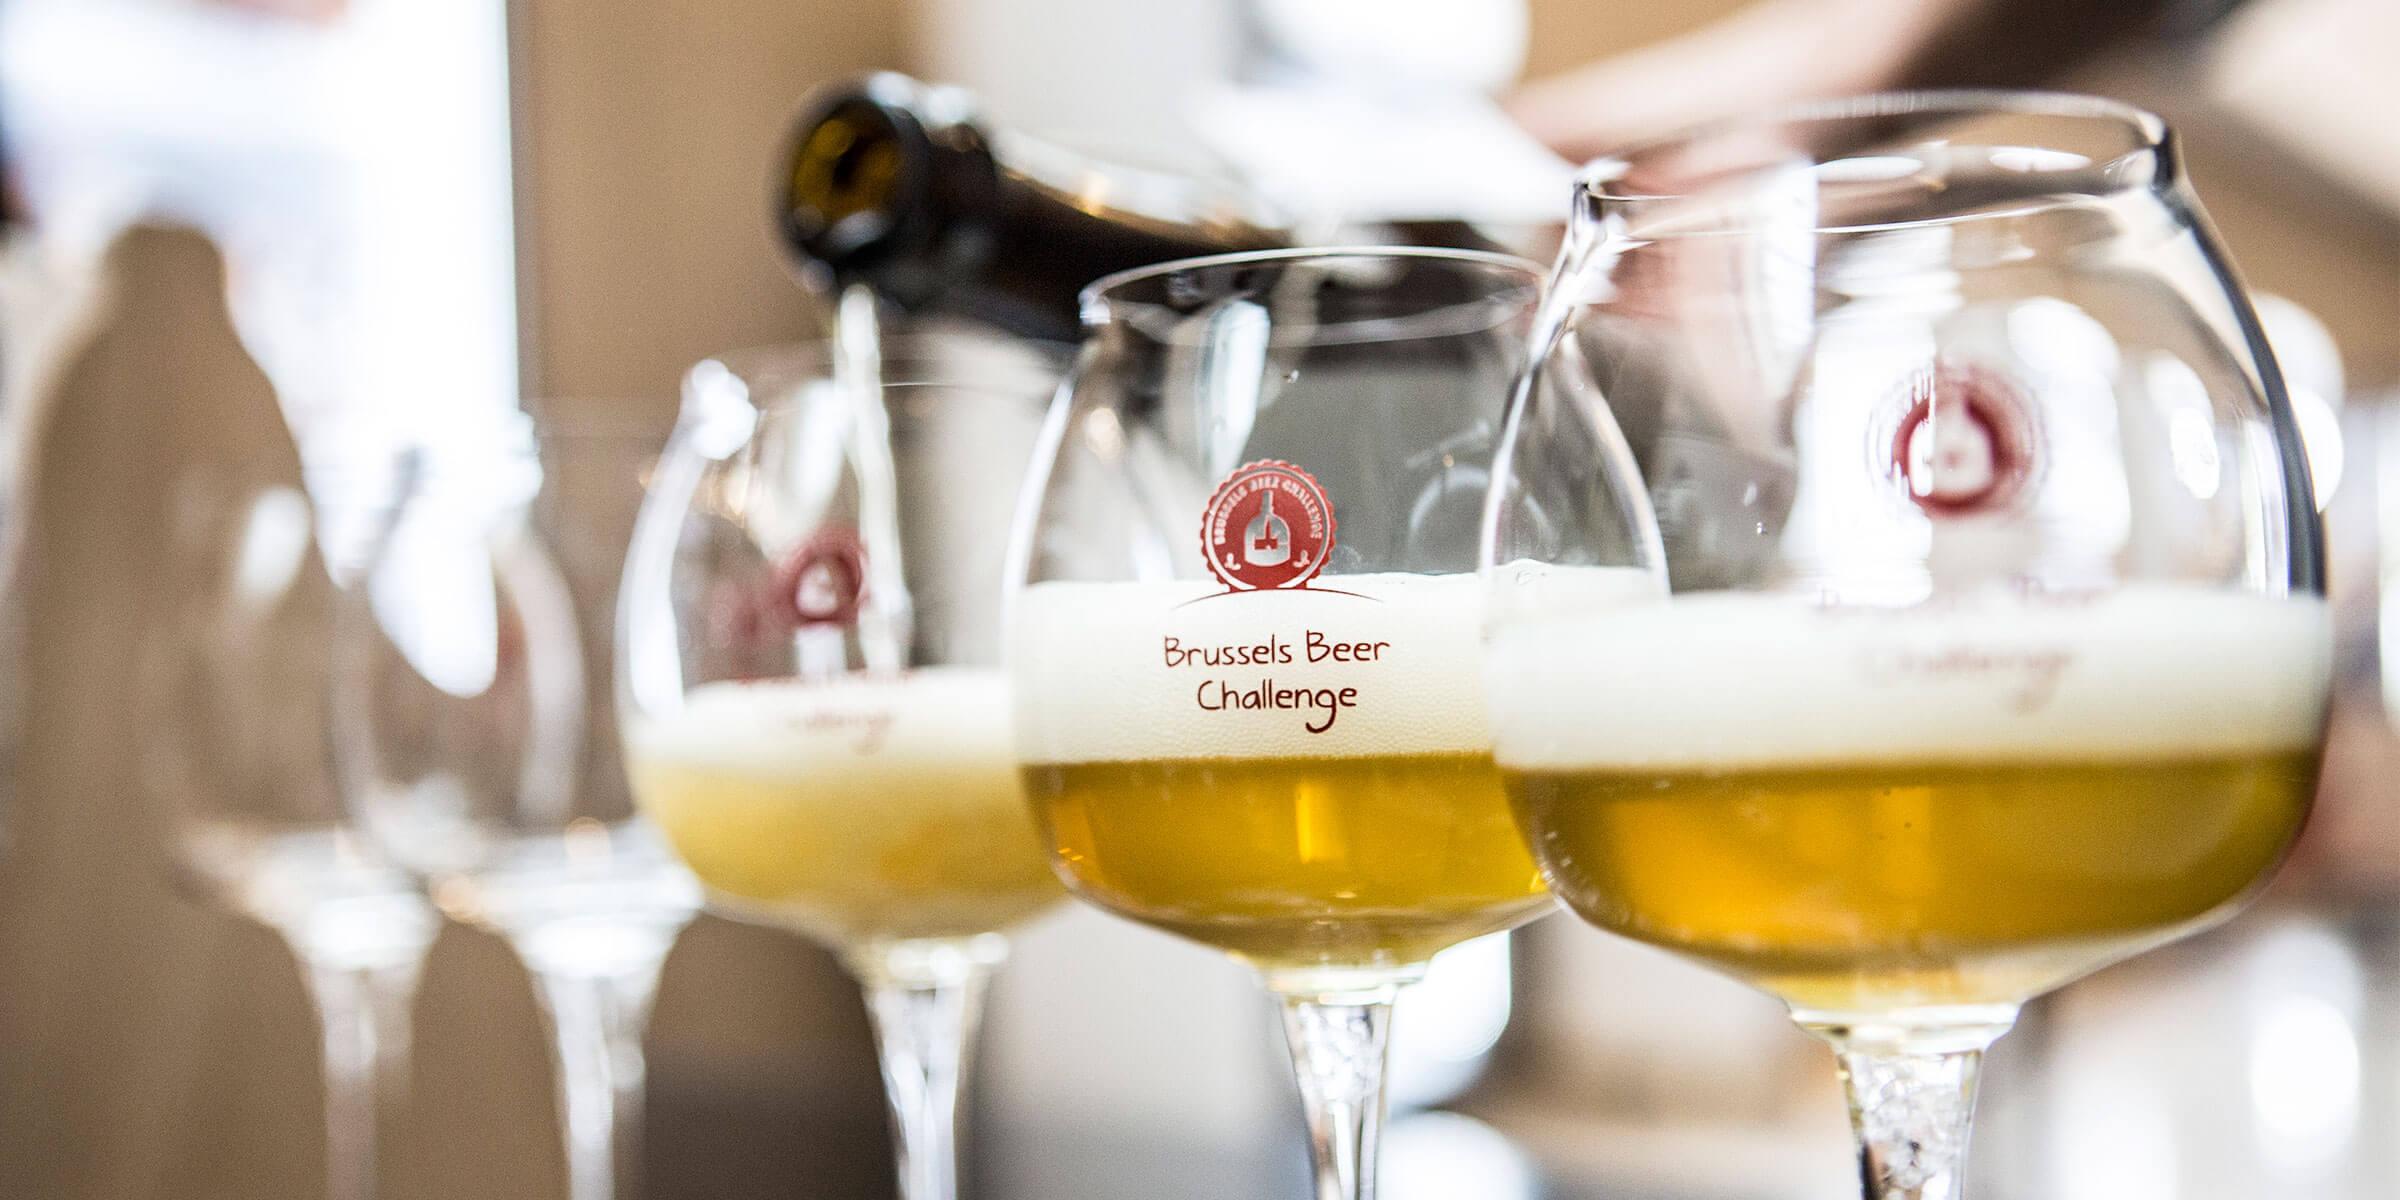 Beer being poured into Brussels Beer Challenge branded Teku glasses